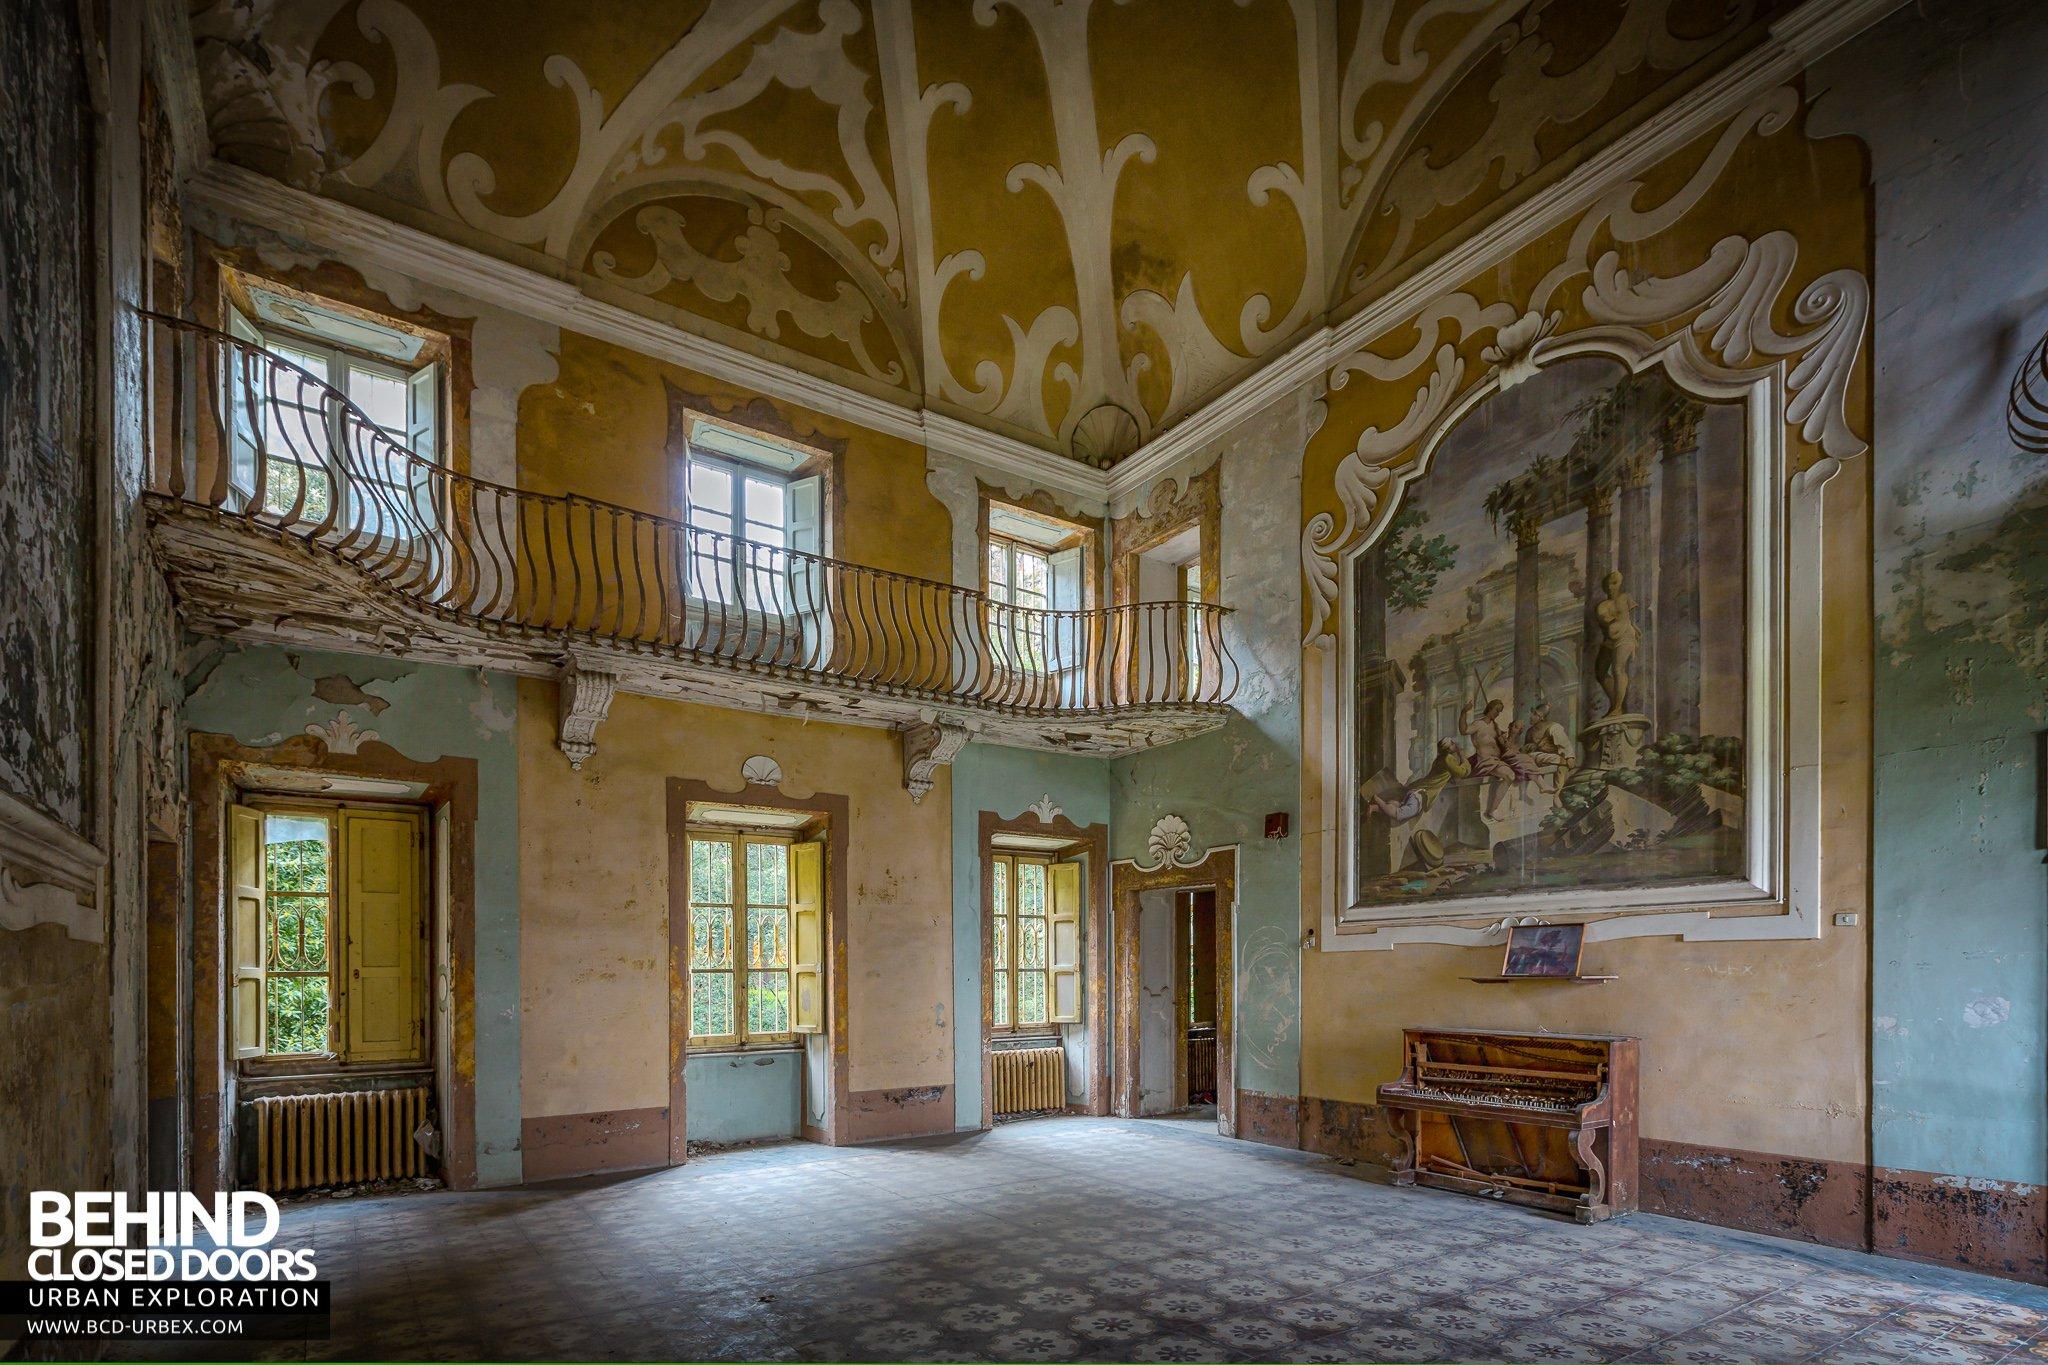 Villa Sbertoli Italy 187 Urbex Behind Closed Doors Urban